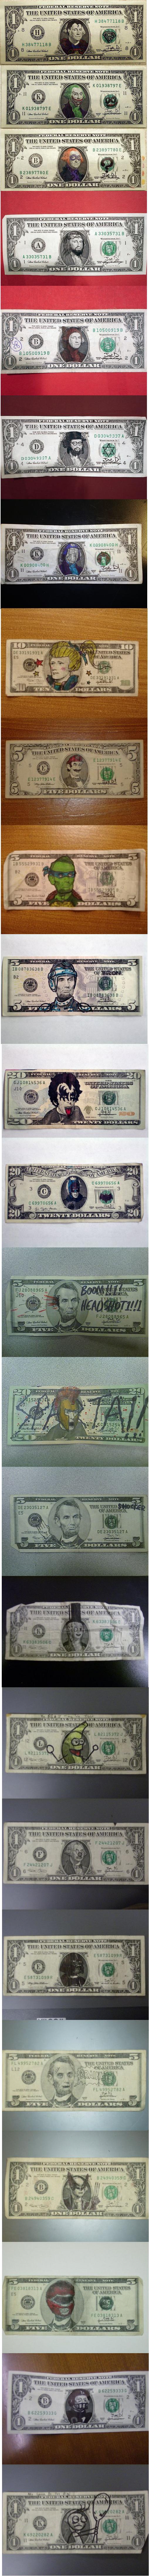 25 best defaced bills. .. aww! What about the boner one? The $1 bill, bONEr. xDD I still think its funny..